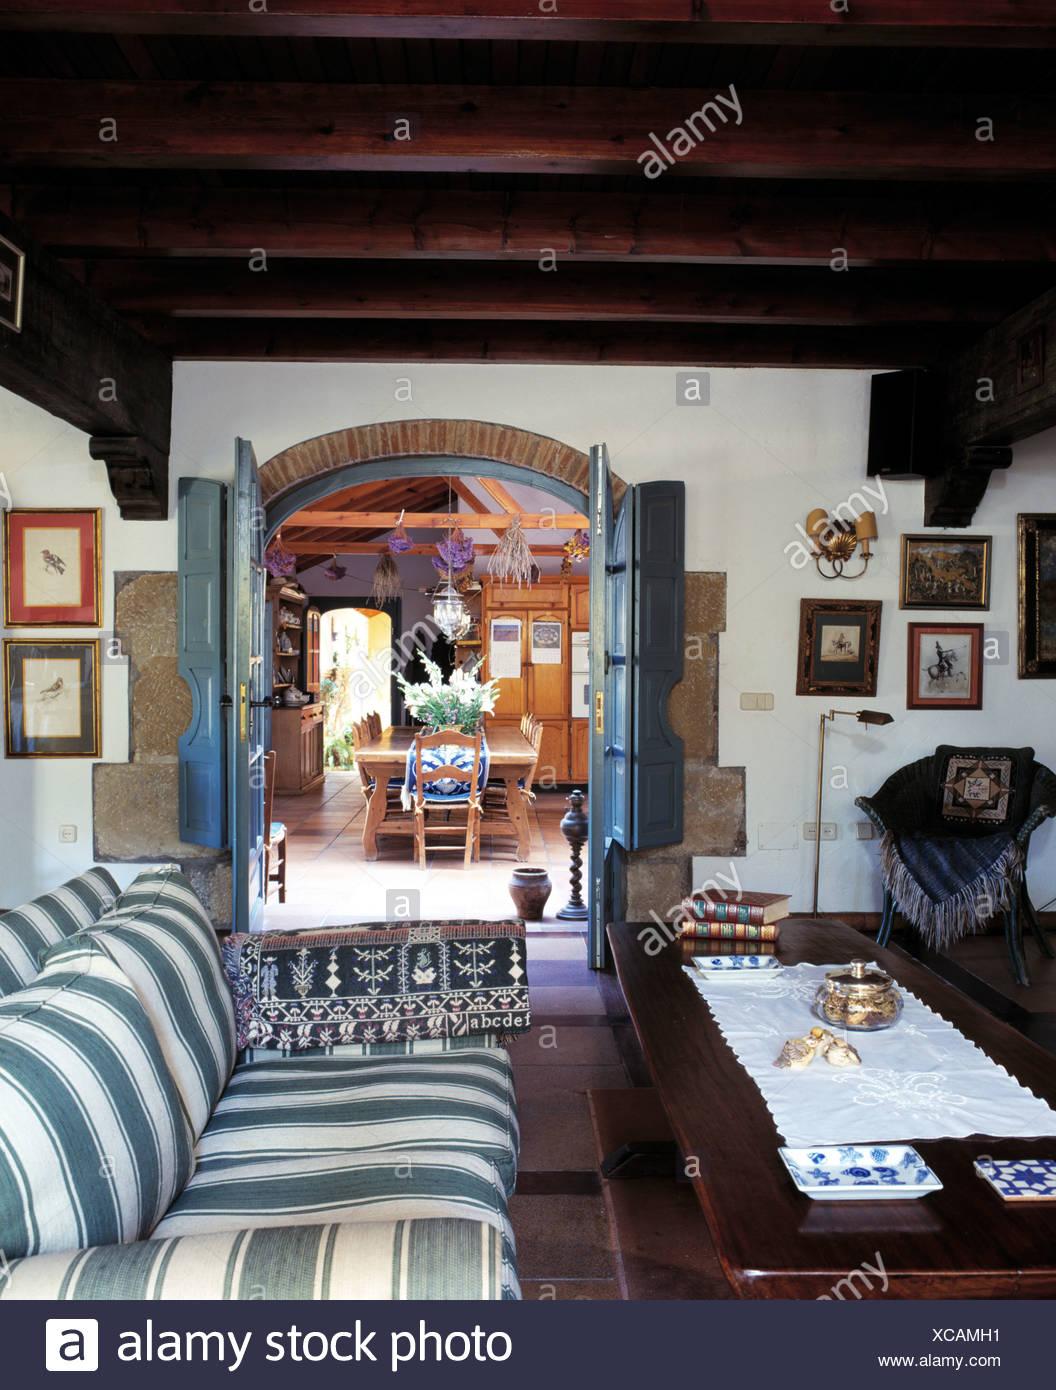 Verde + bianco divano a strisce di legno e un tavolo da caffè in ...